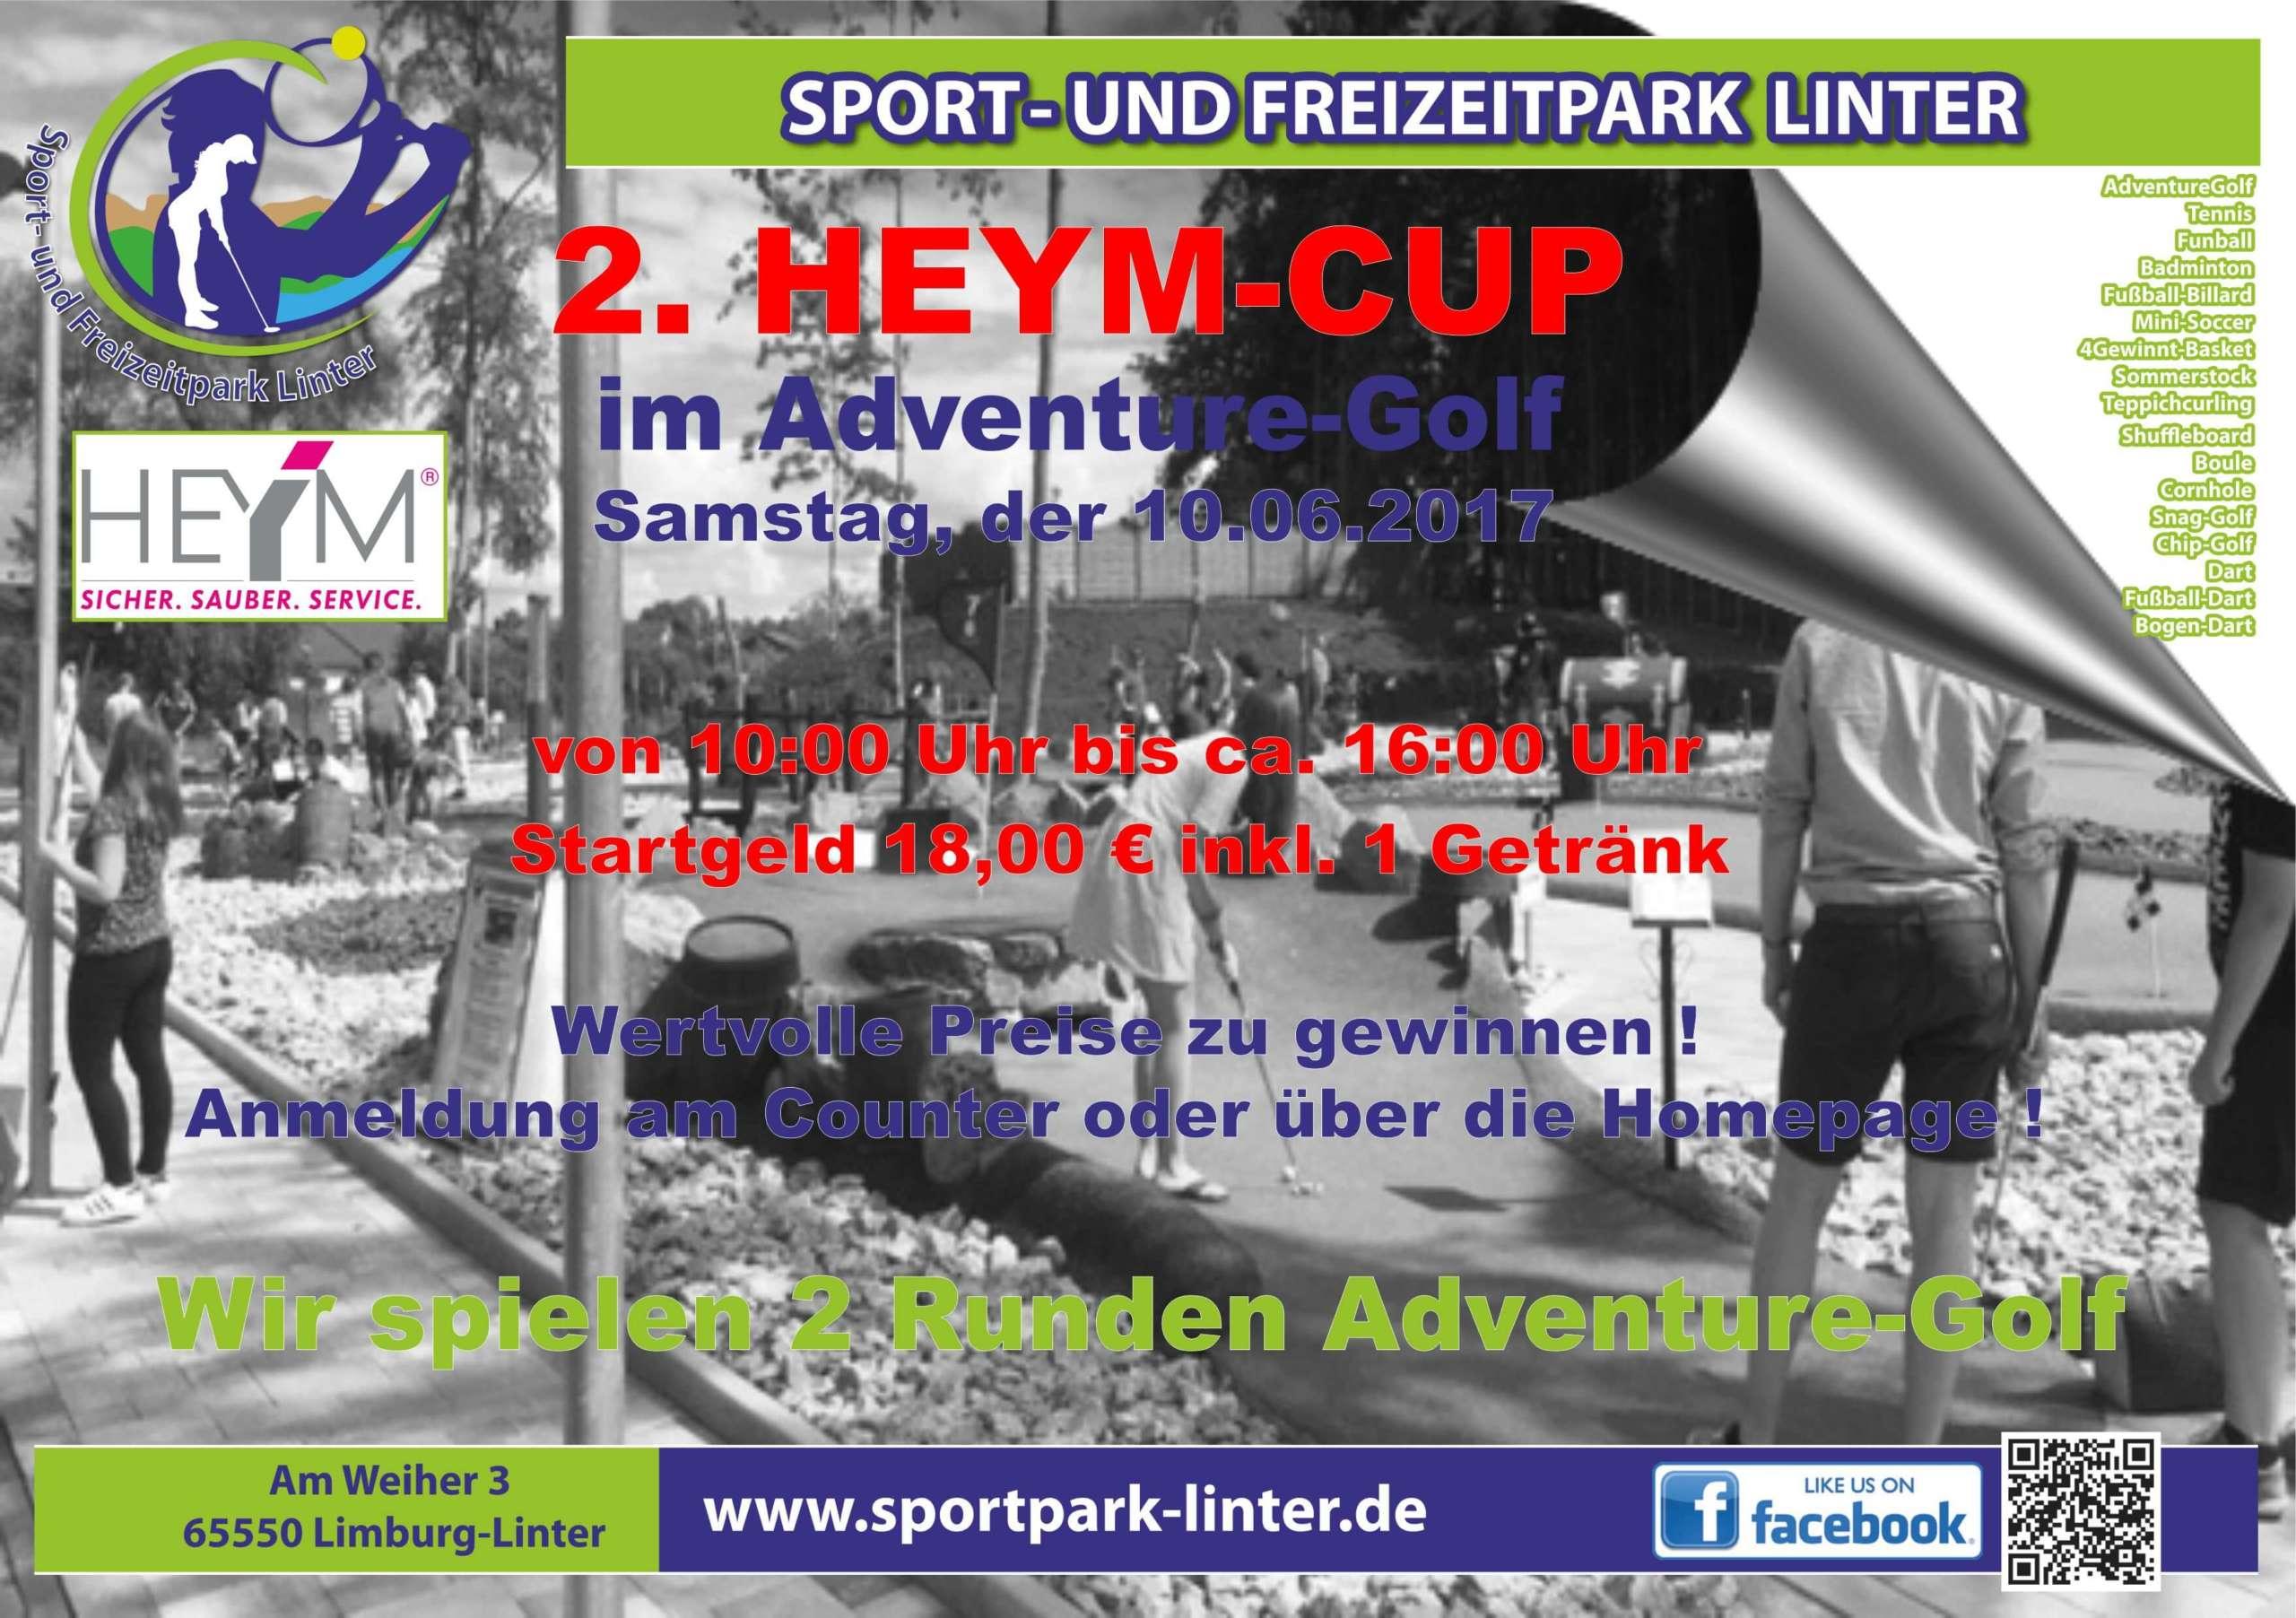 2. HEYM-CUP 2017